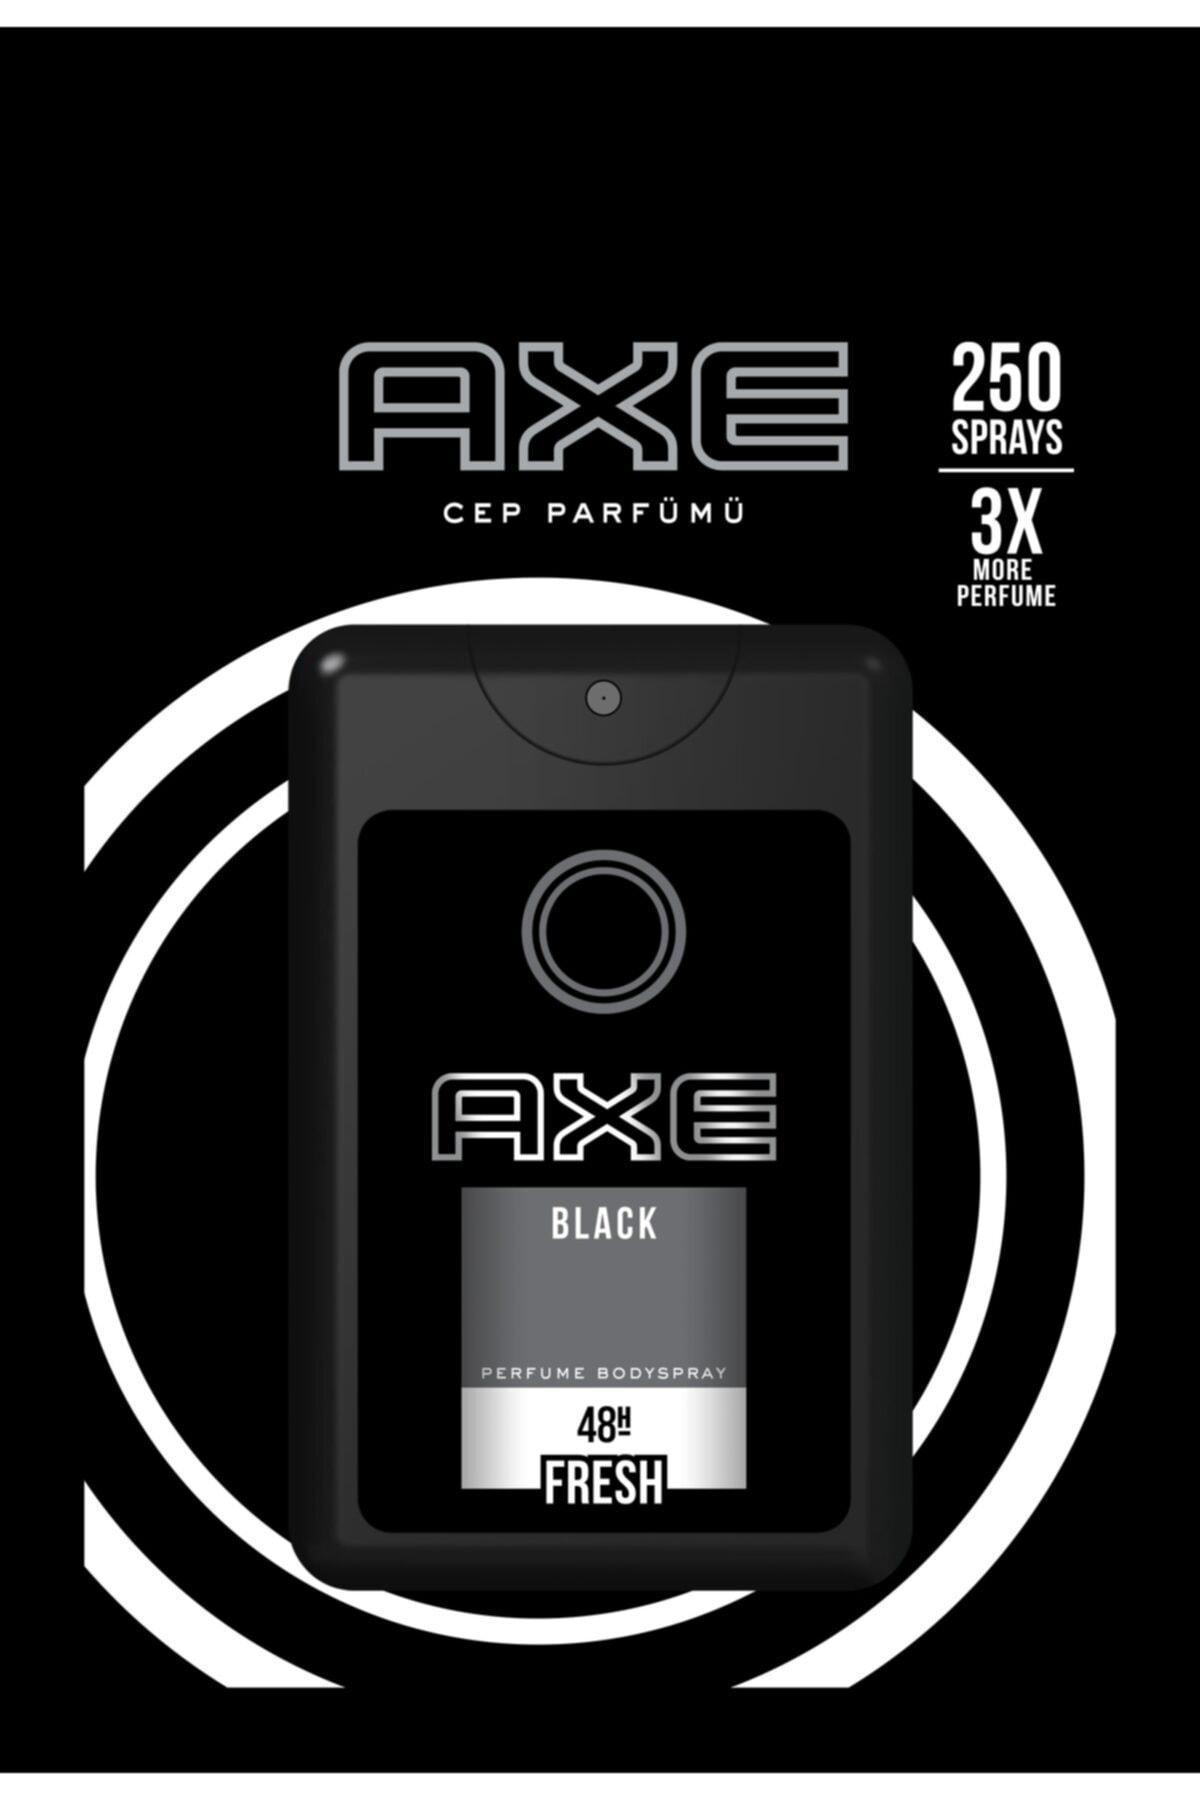 Axe Cep Parfumu Black 17 ml 1